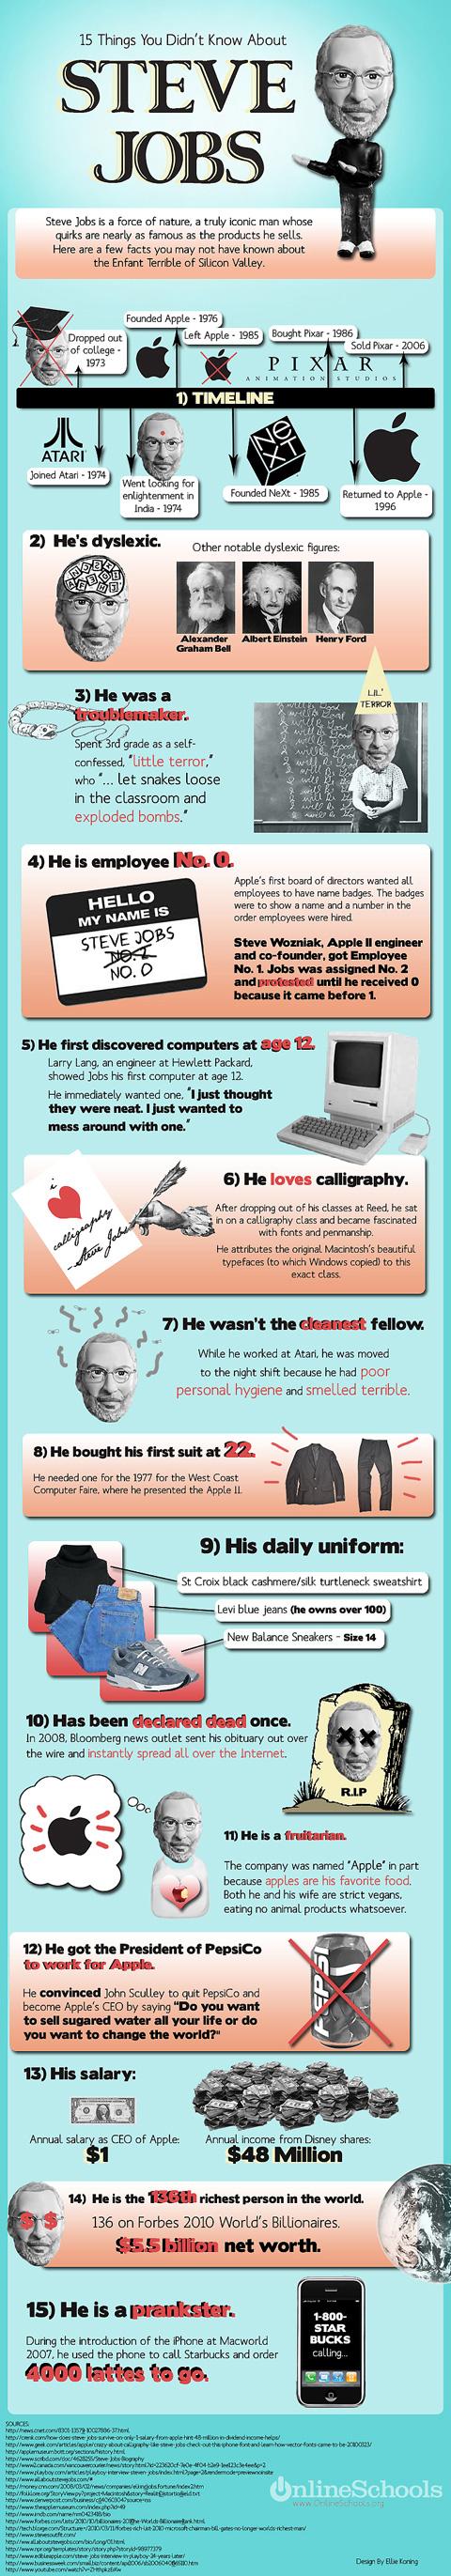 15 Faits méconnus sur Steve Jobs